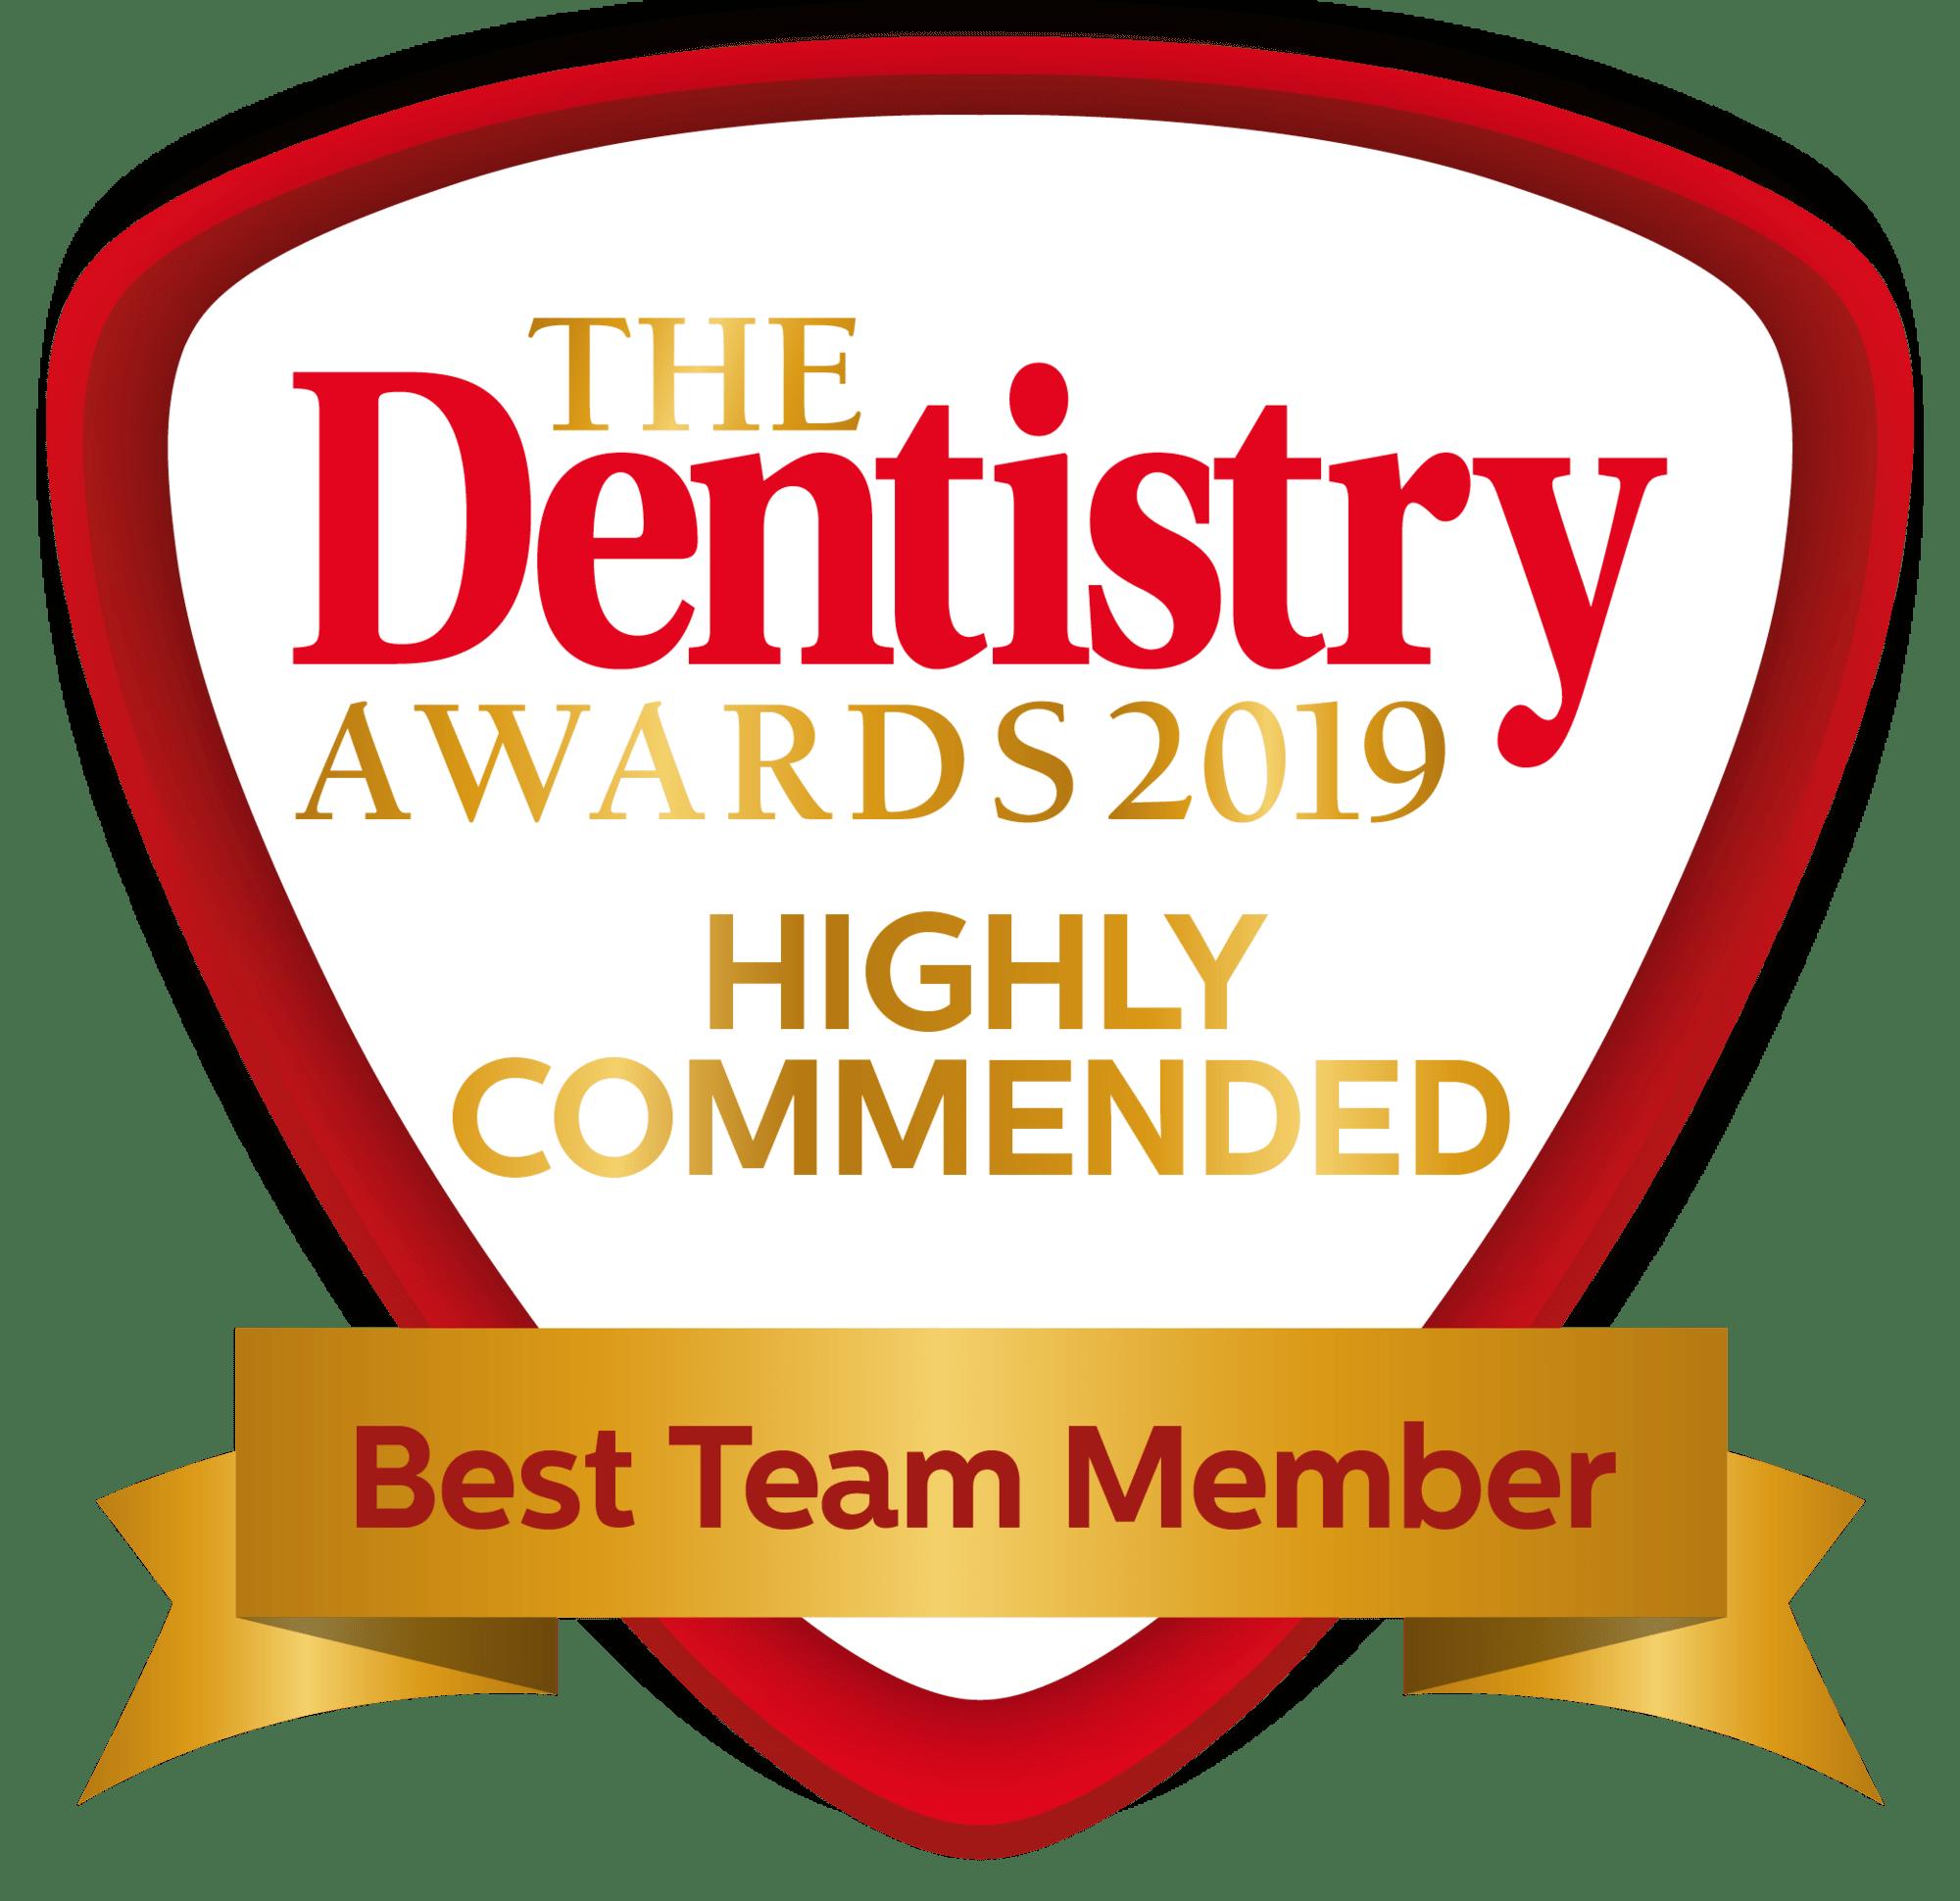 Dentistry awards 2020 best team member highly commended badge